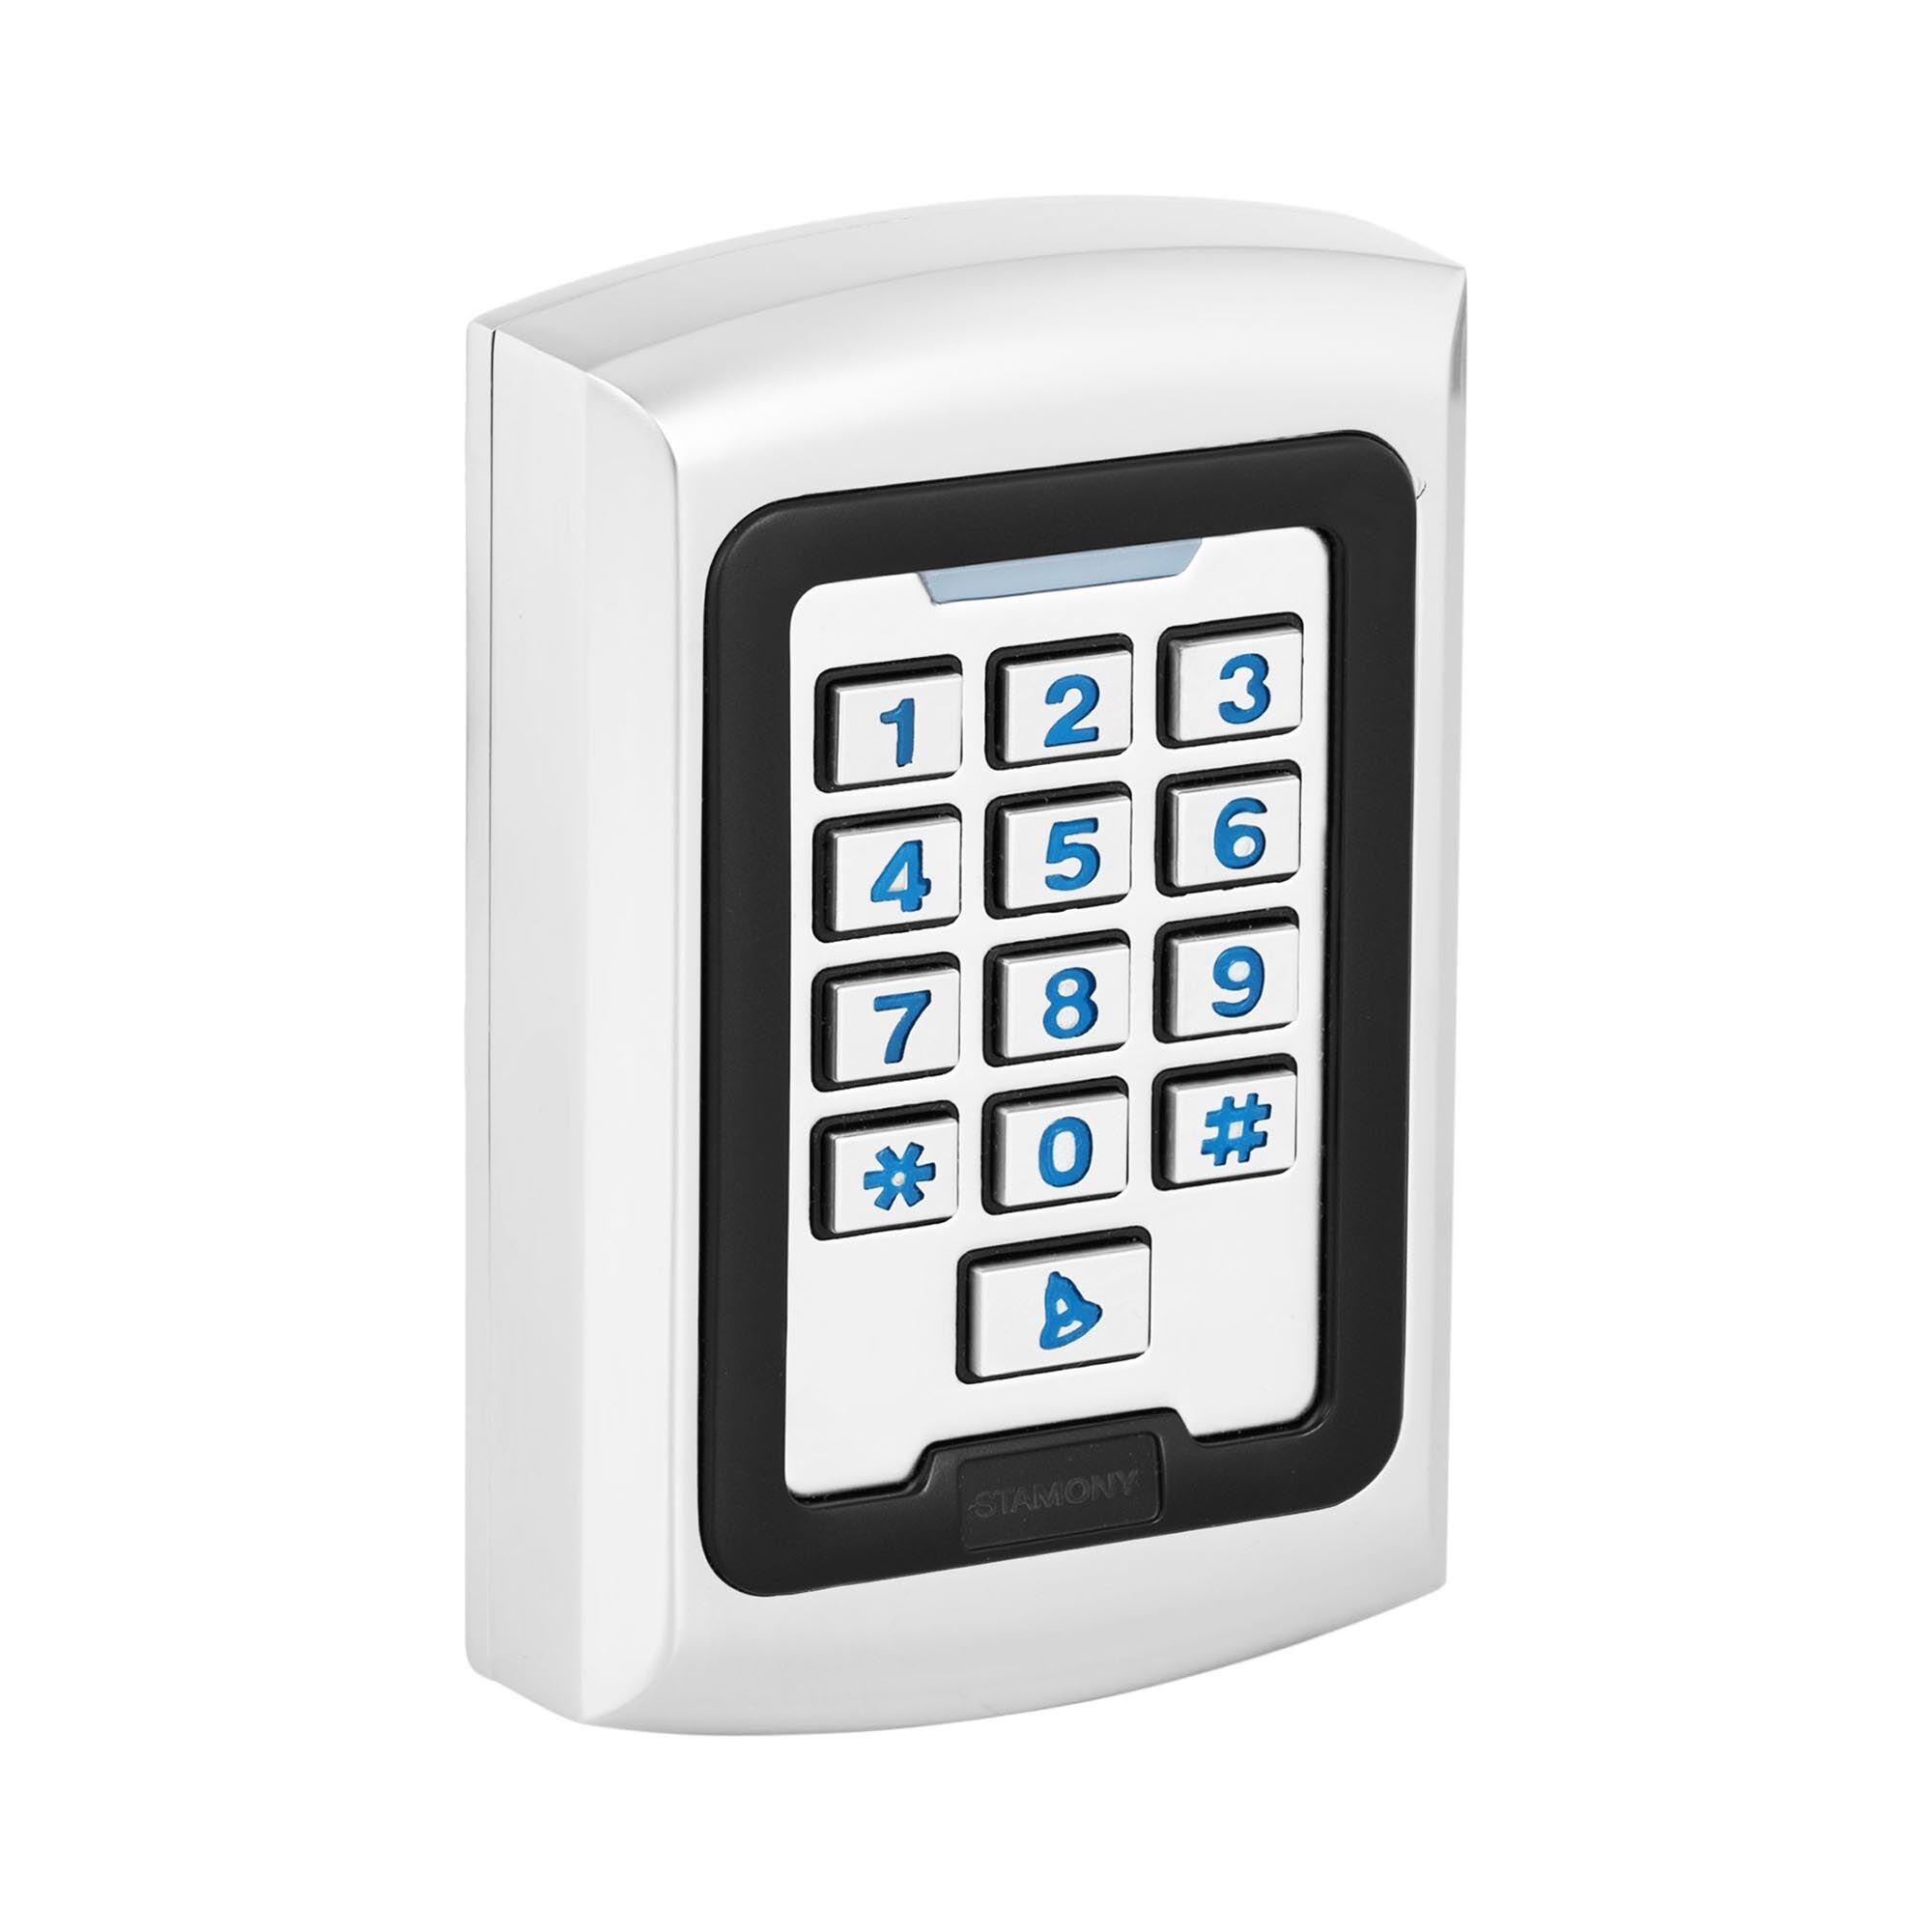 Stamony Clavier code ST-CS-600 - PIN/Carte RFID - Type EM - 2 000 espaces de sauvegarde - WG 26